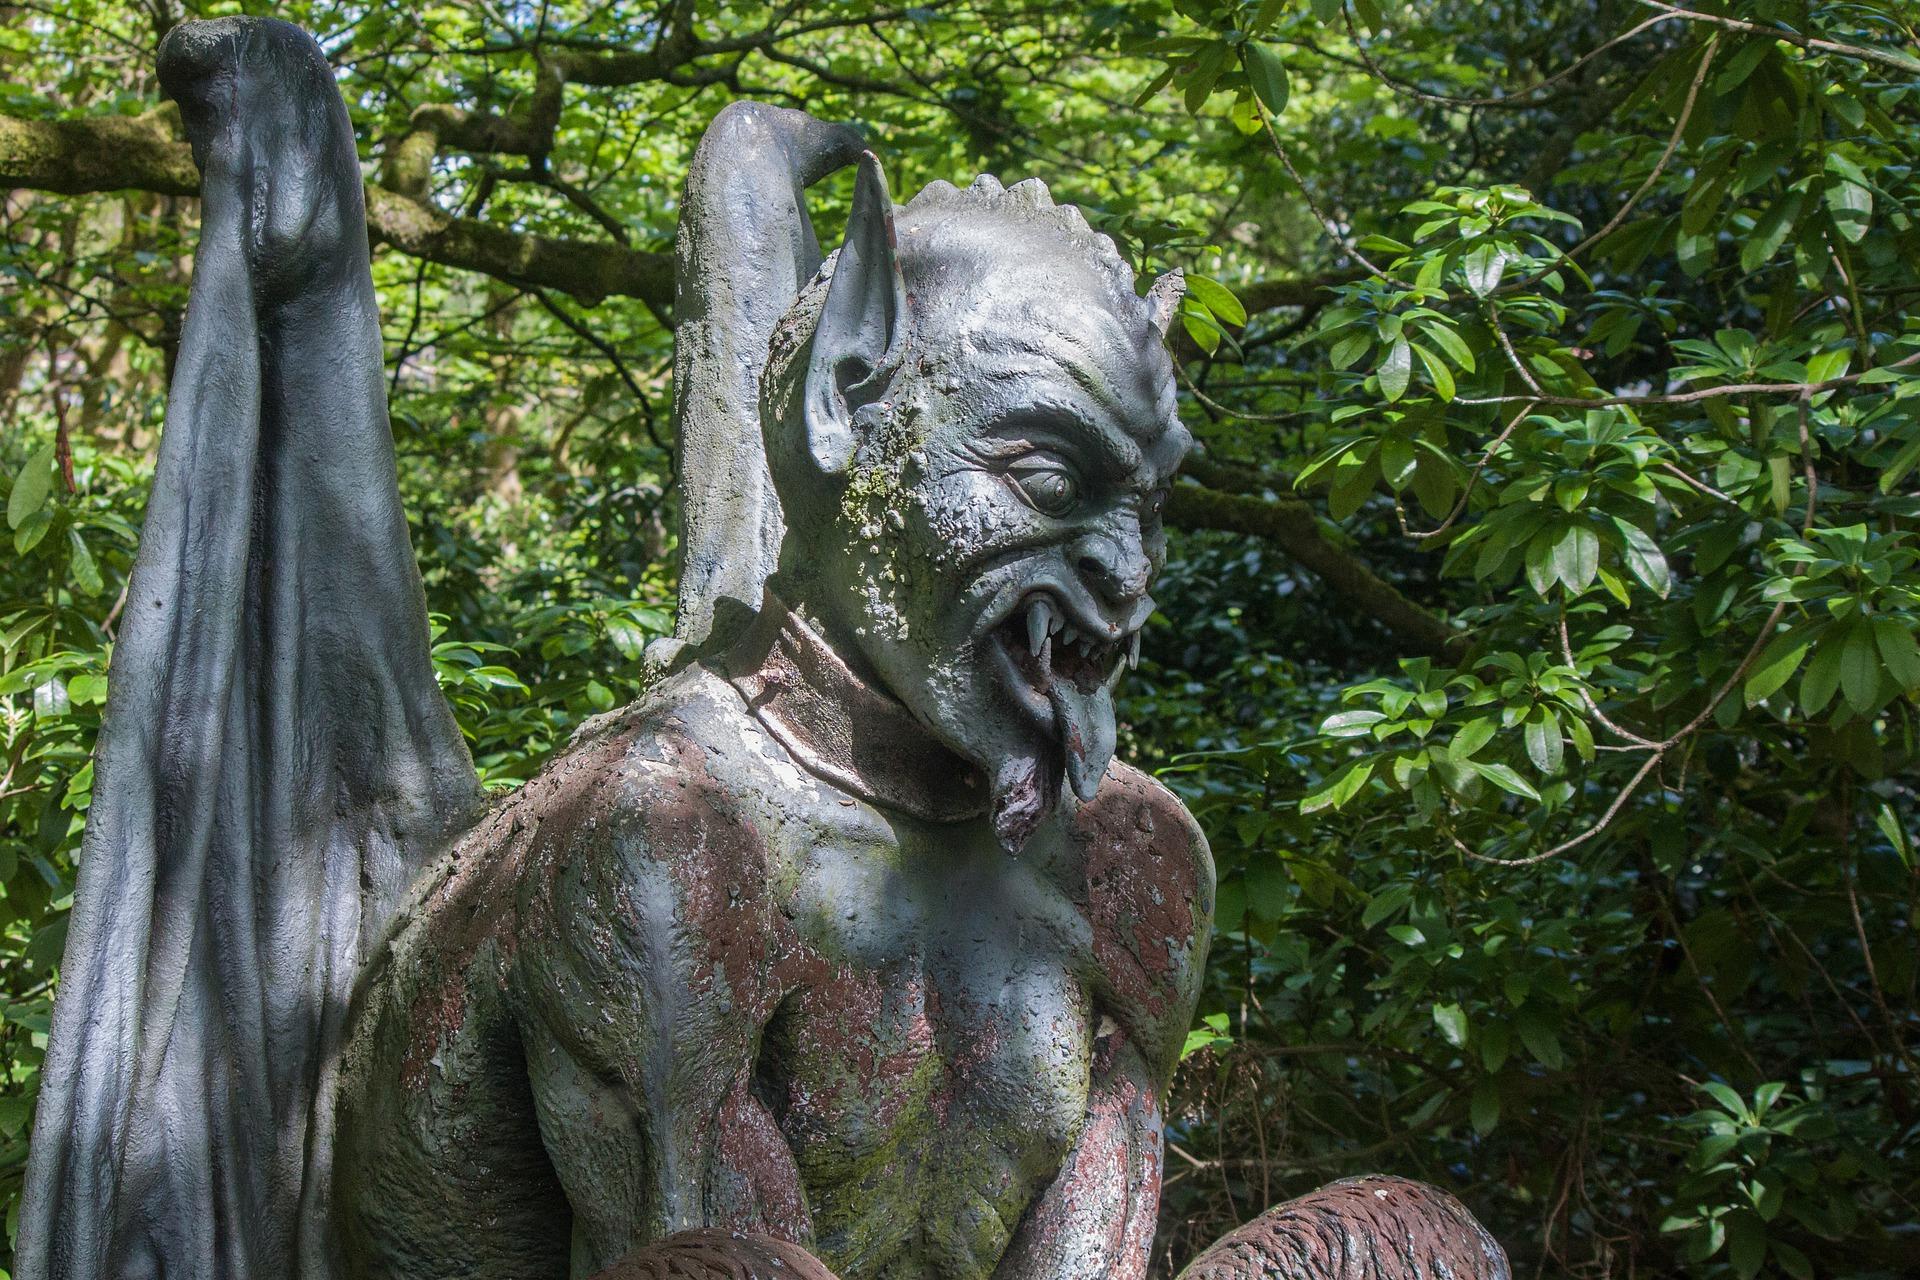 sculpture-4201186_1920